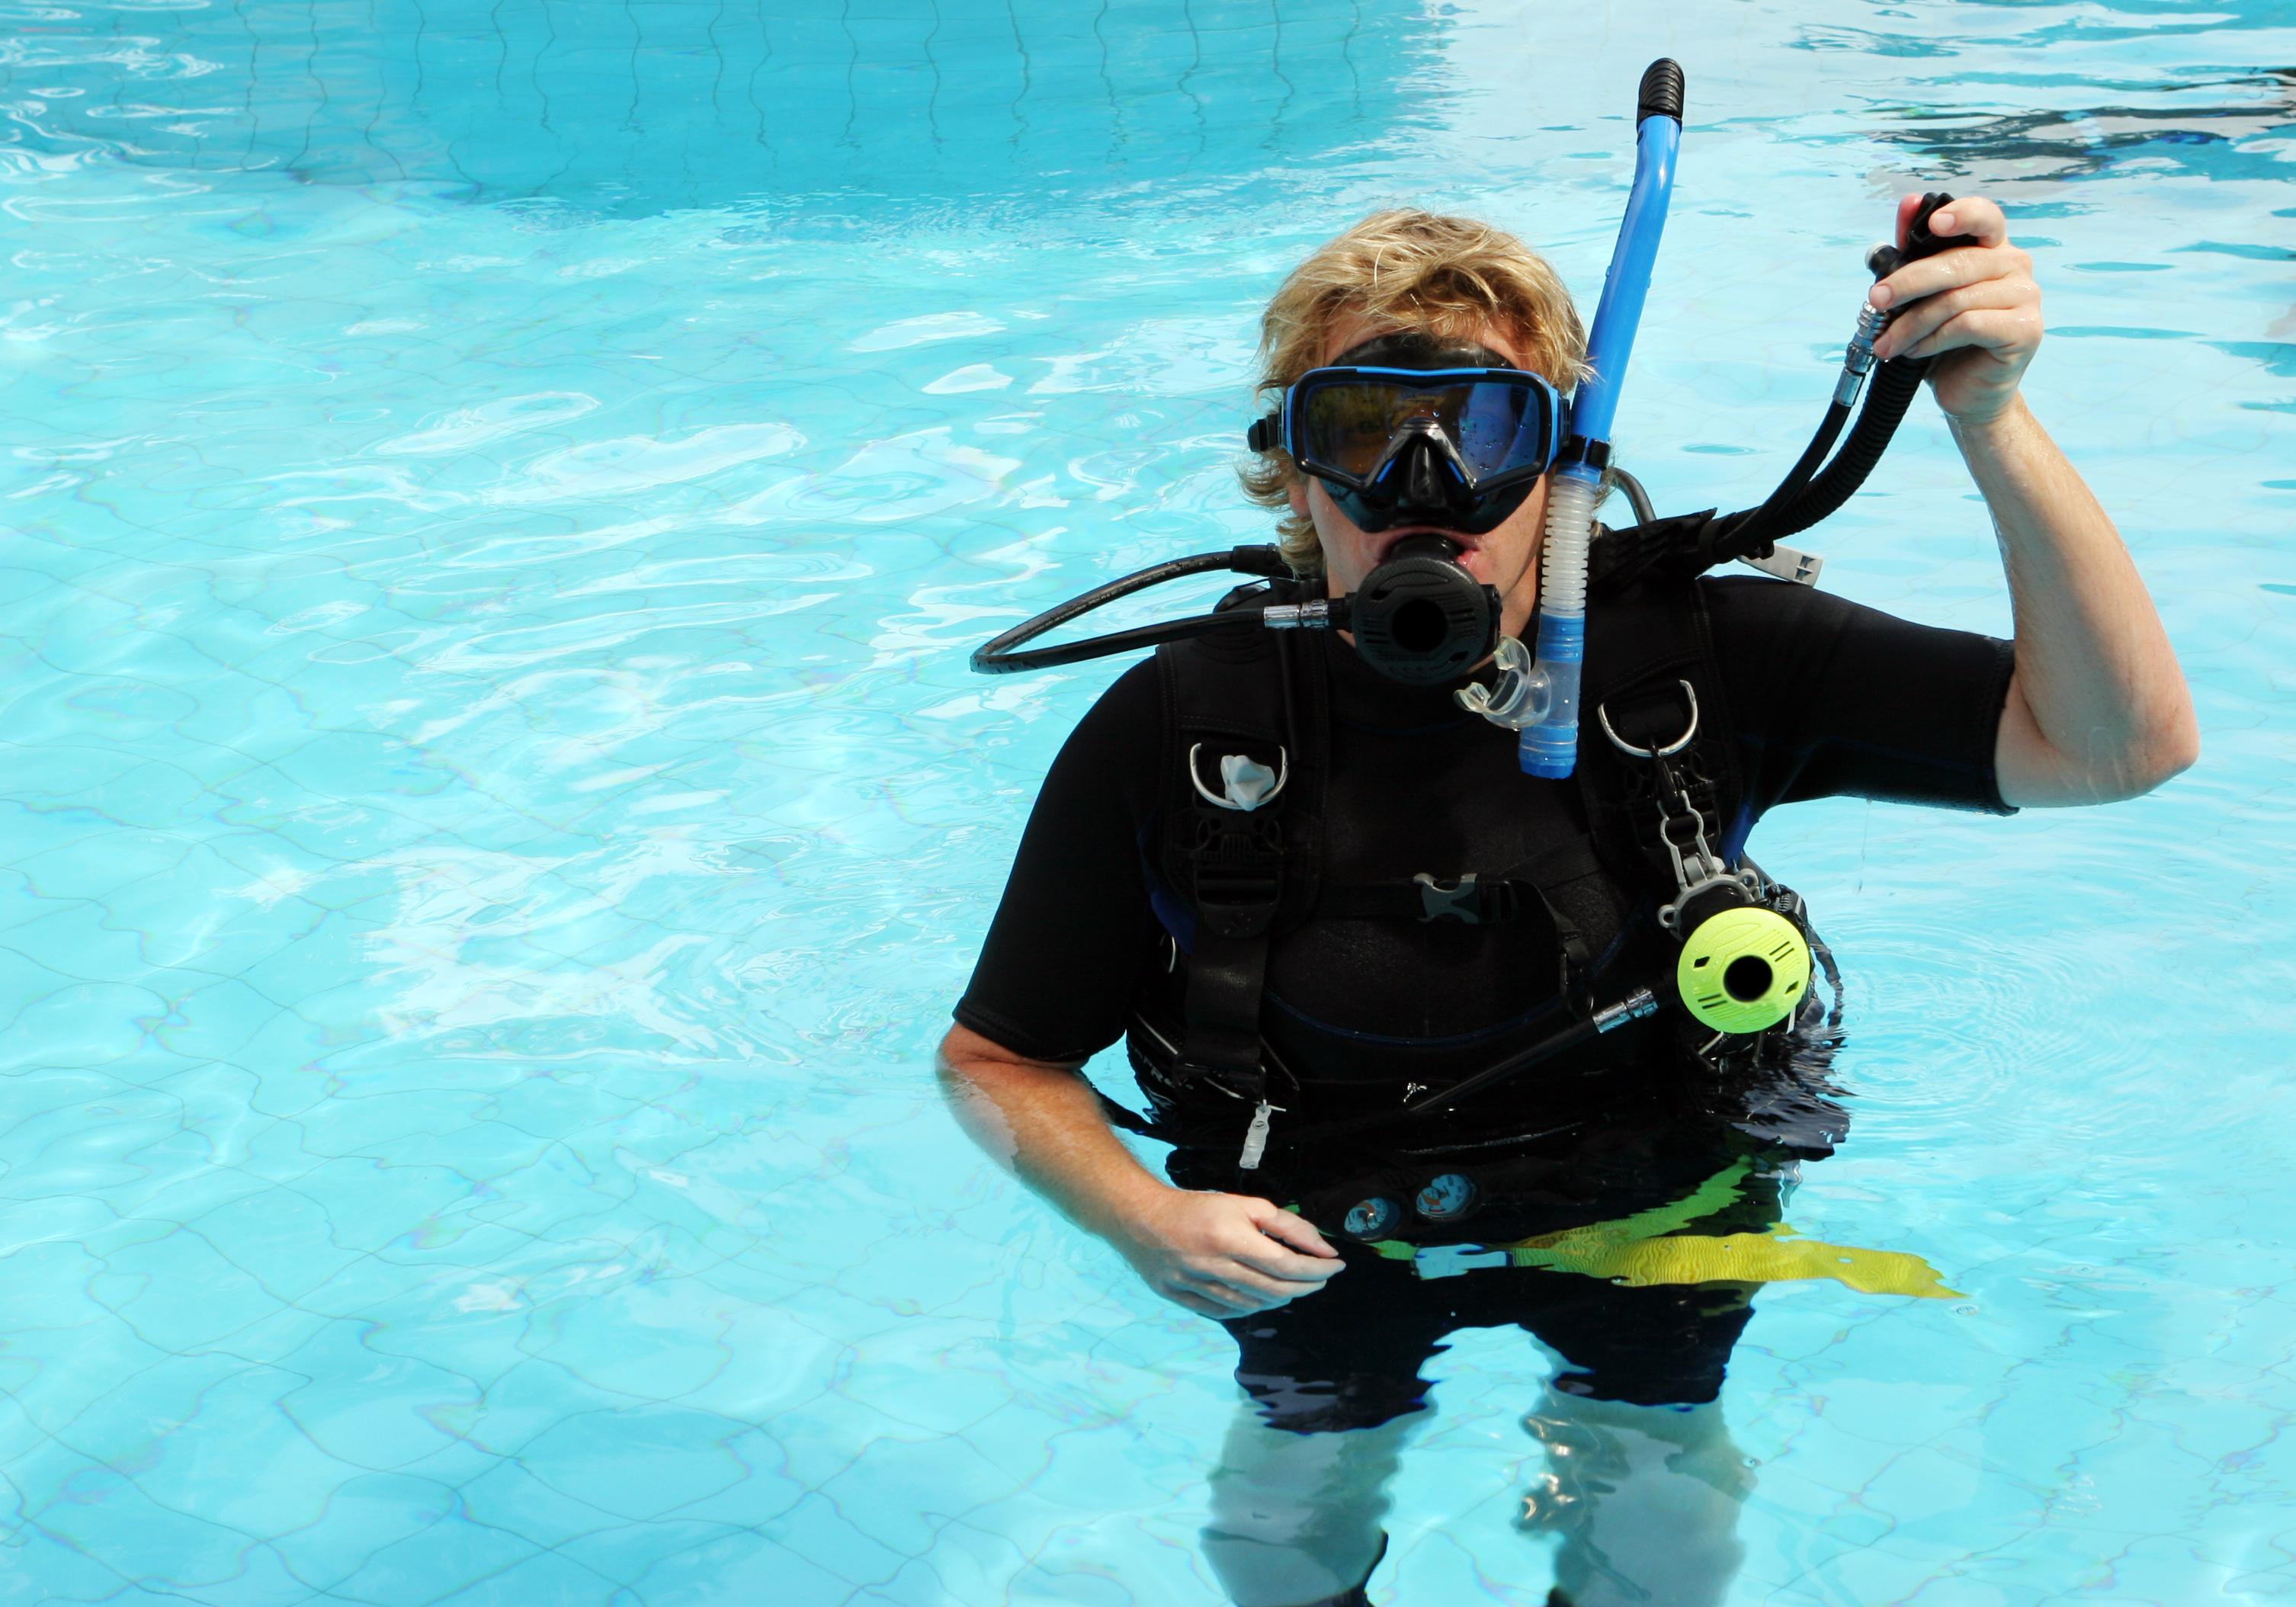 Ten Rules For Safe Scuba Diving • Scuba Diver Life